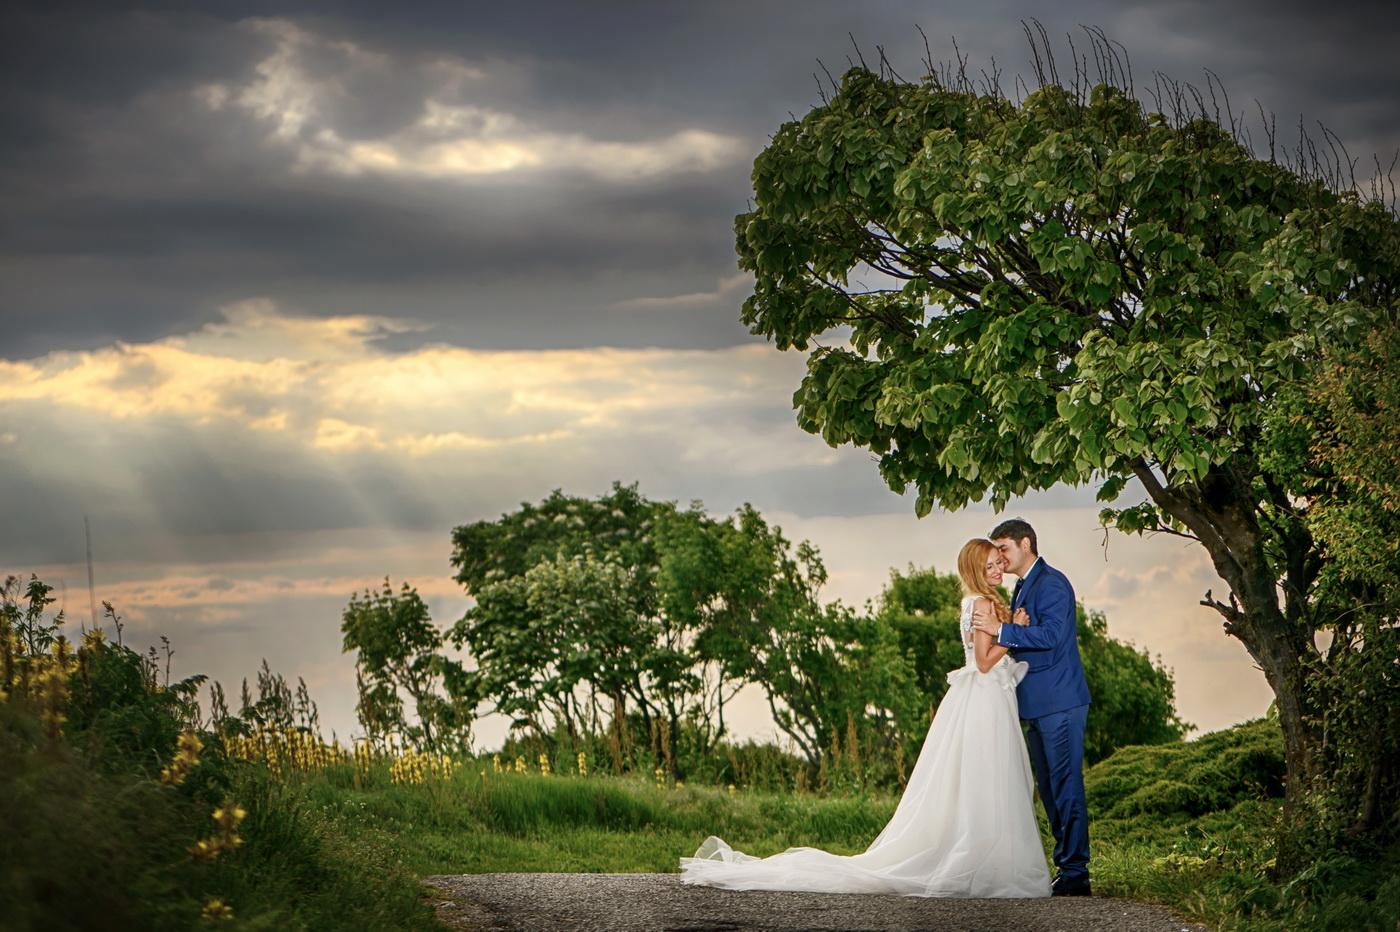 Destination Wedding Photographer_Marian Sterea_090.jpg